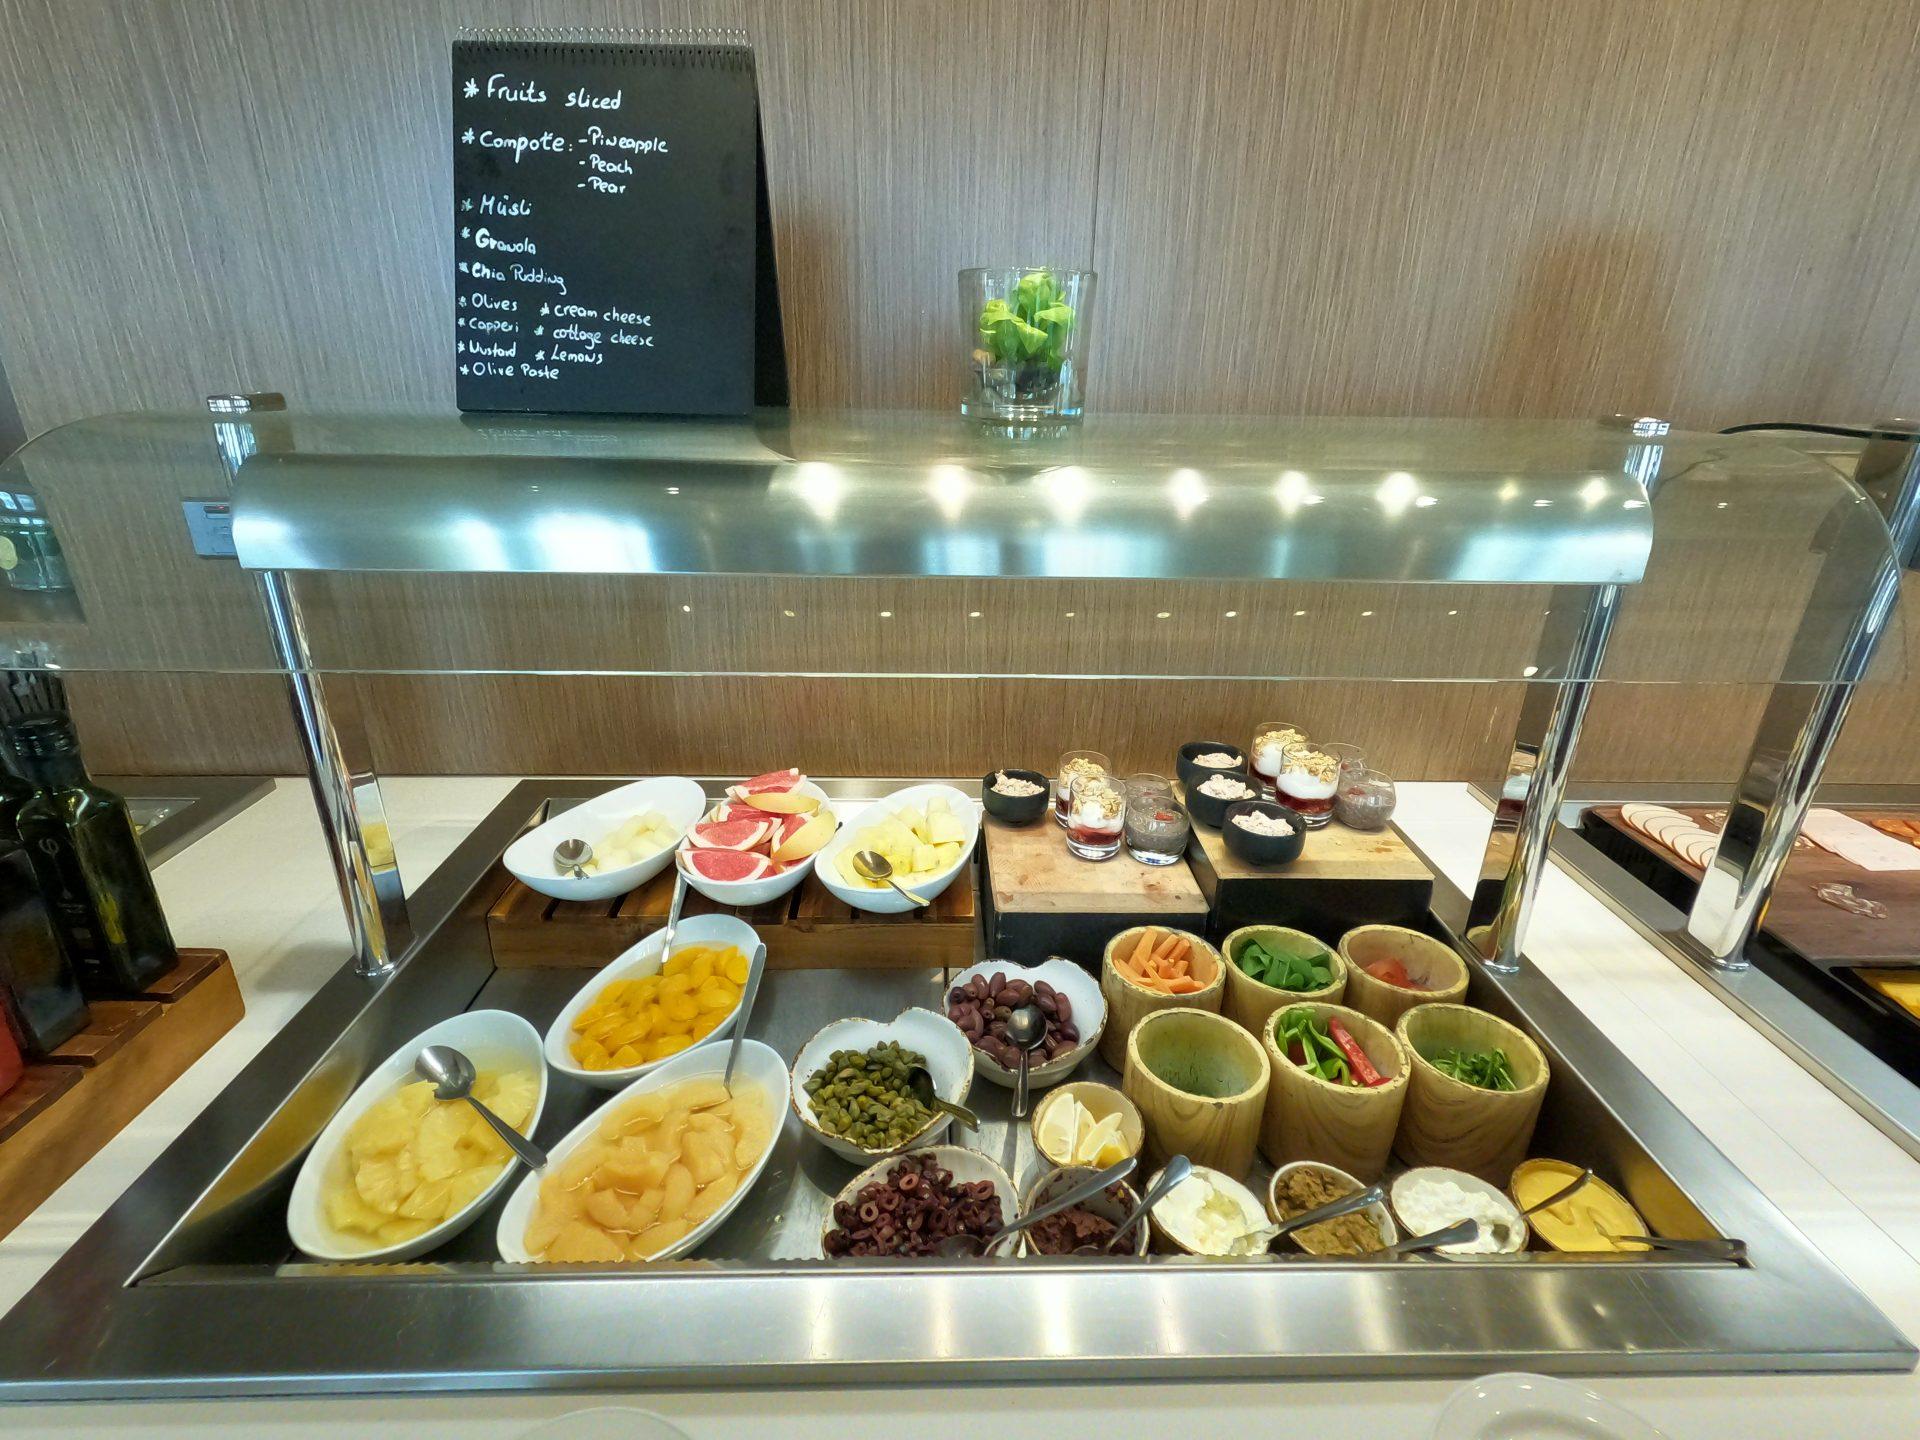 Sliced fruits, musli, granola, chia pudding and more